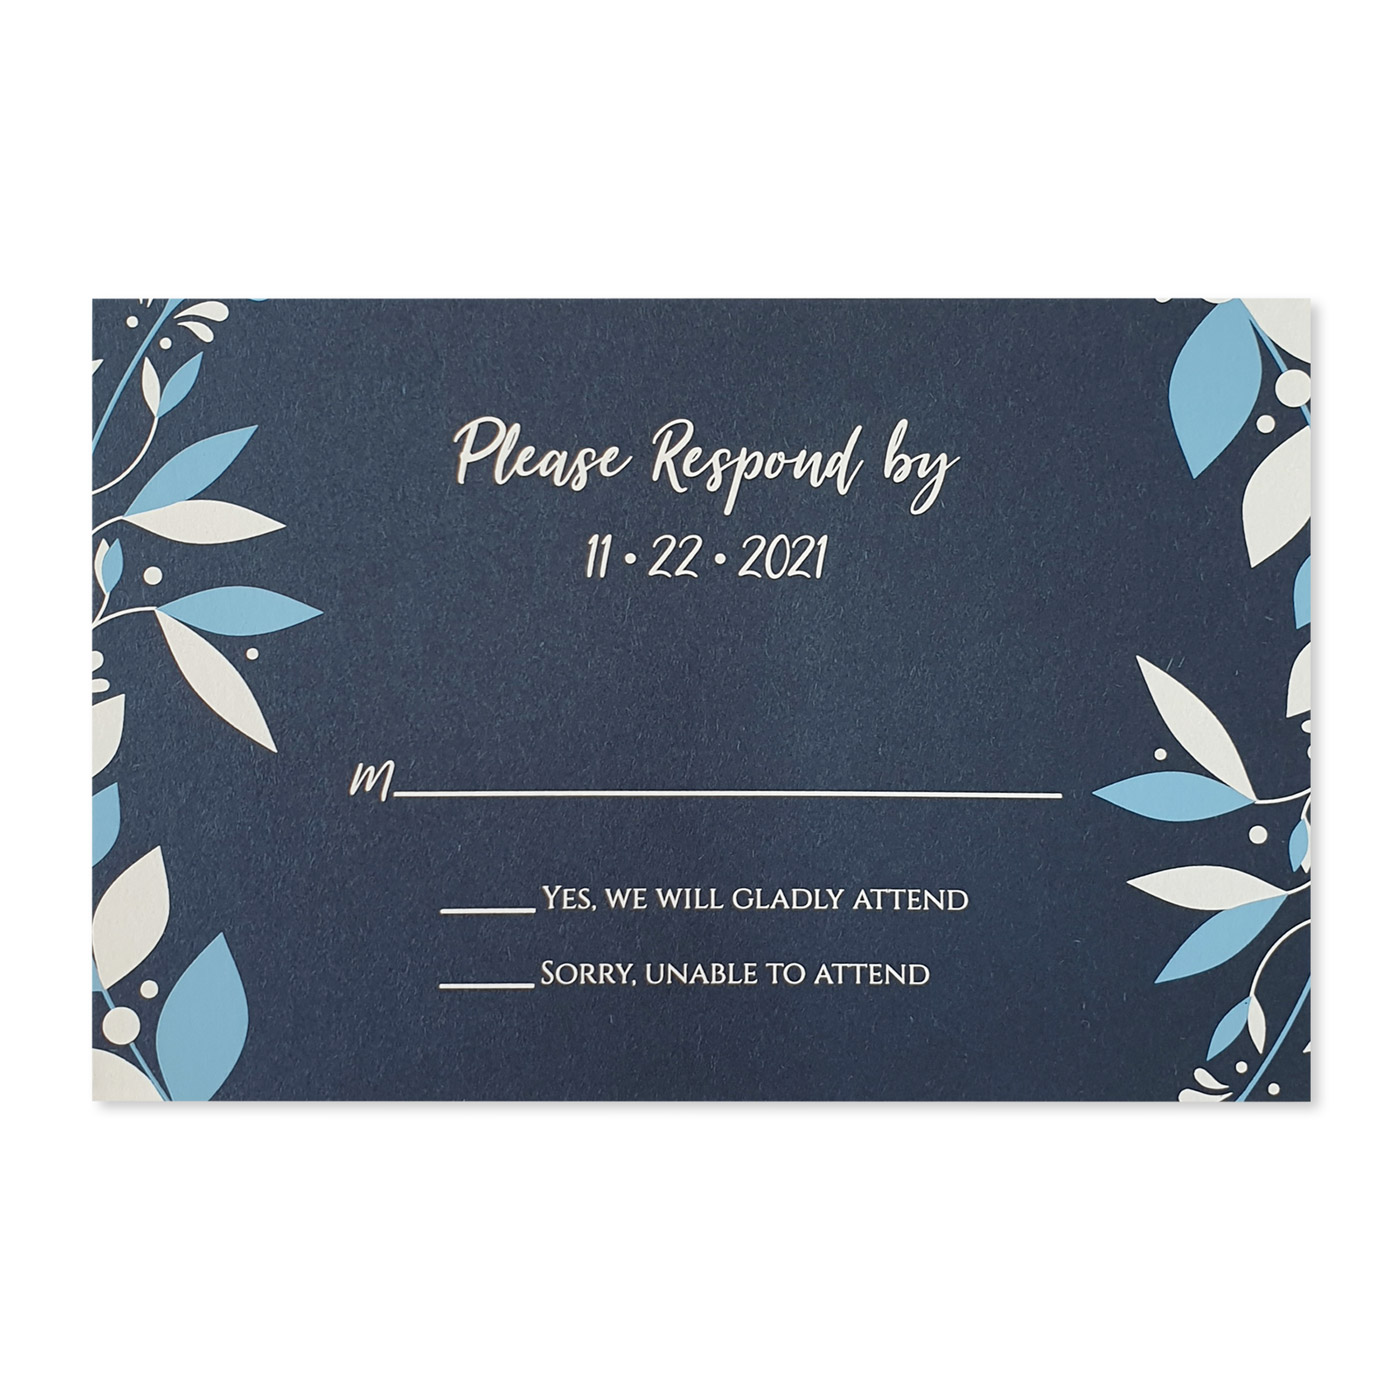 RSVP Cards : RSVP-CORNER_WREATH - 123WeddingCards